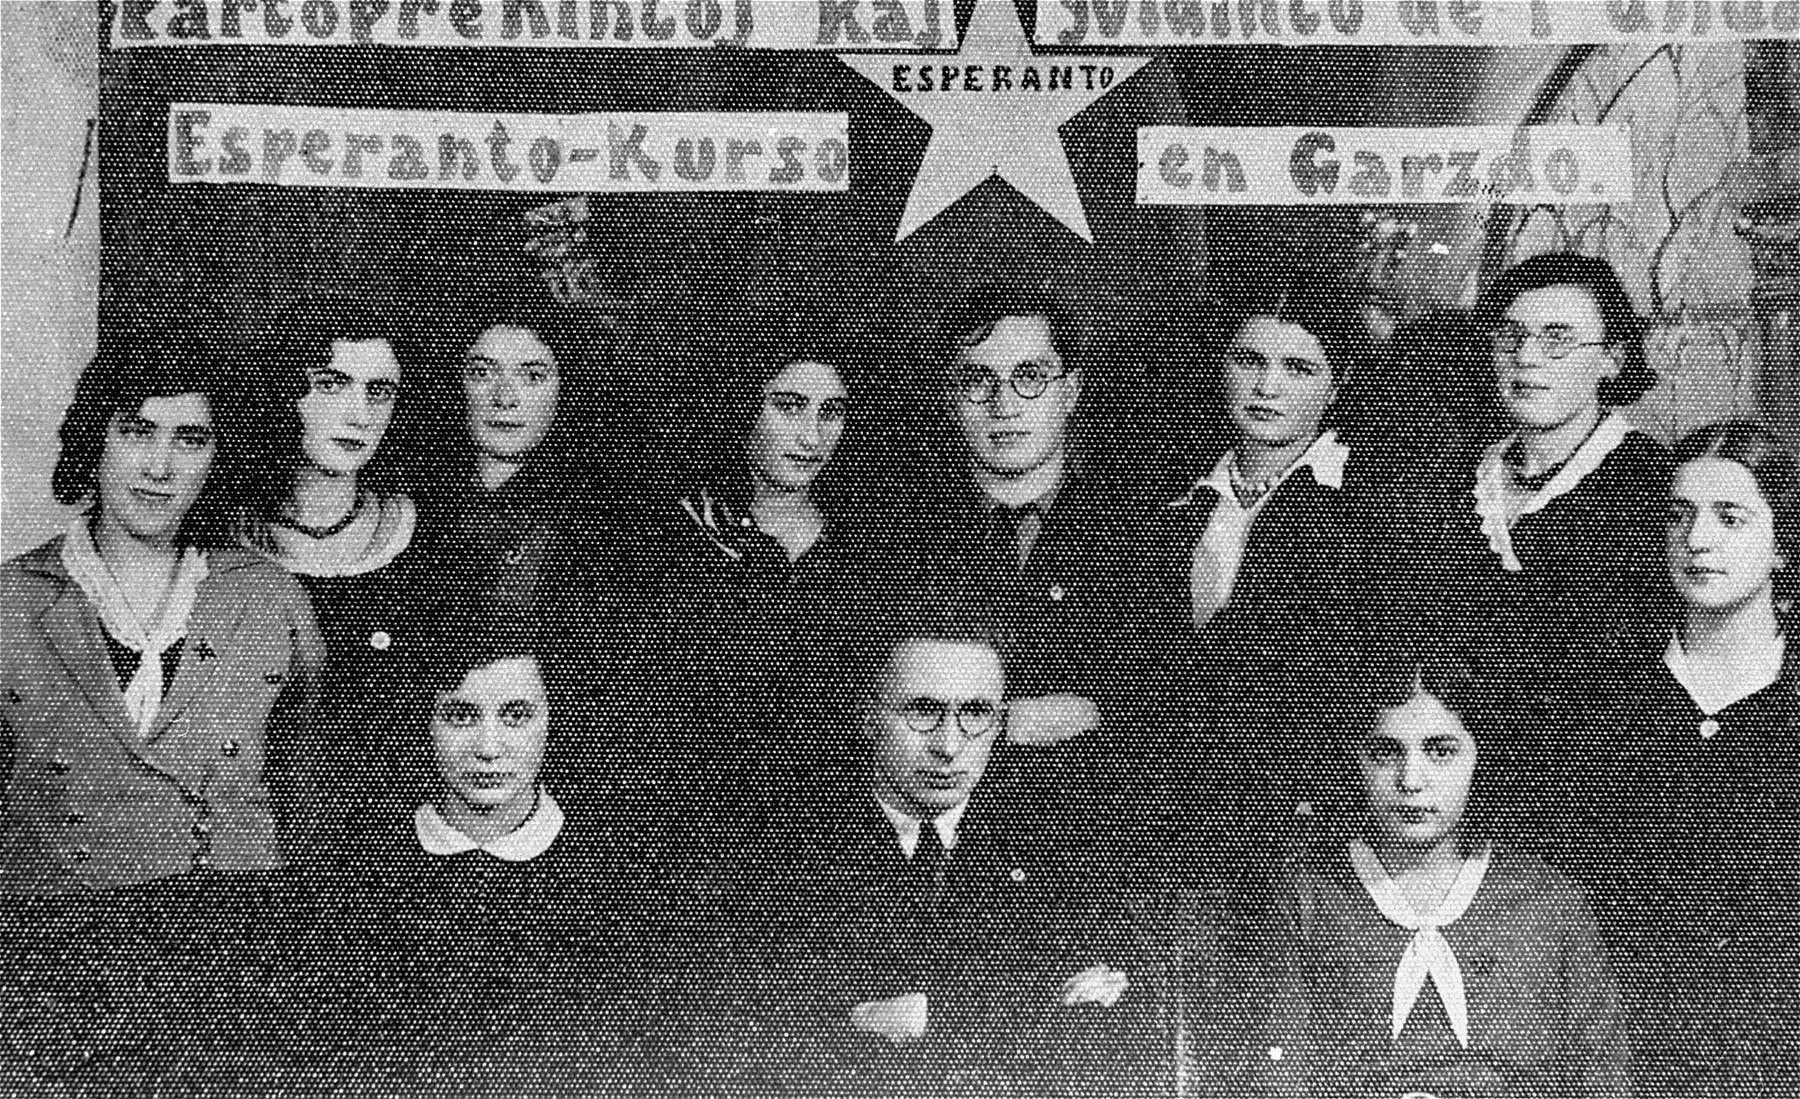 Group portrait of an Esperanto class in Gargzdai, Lithuania.